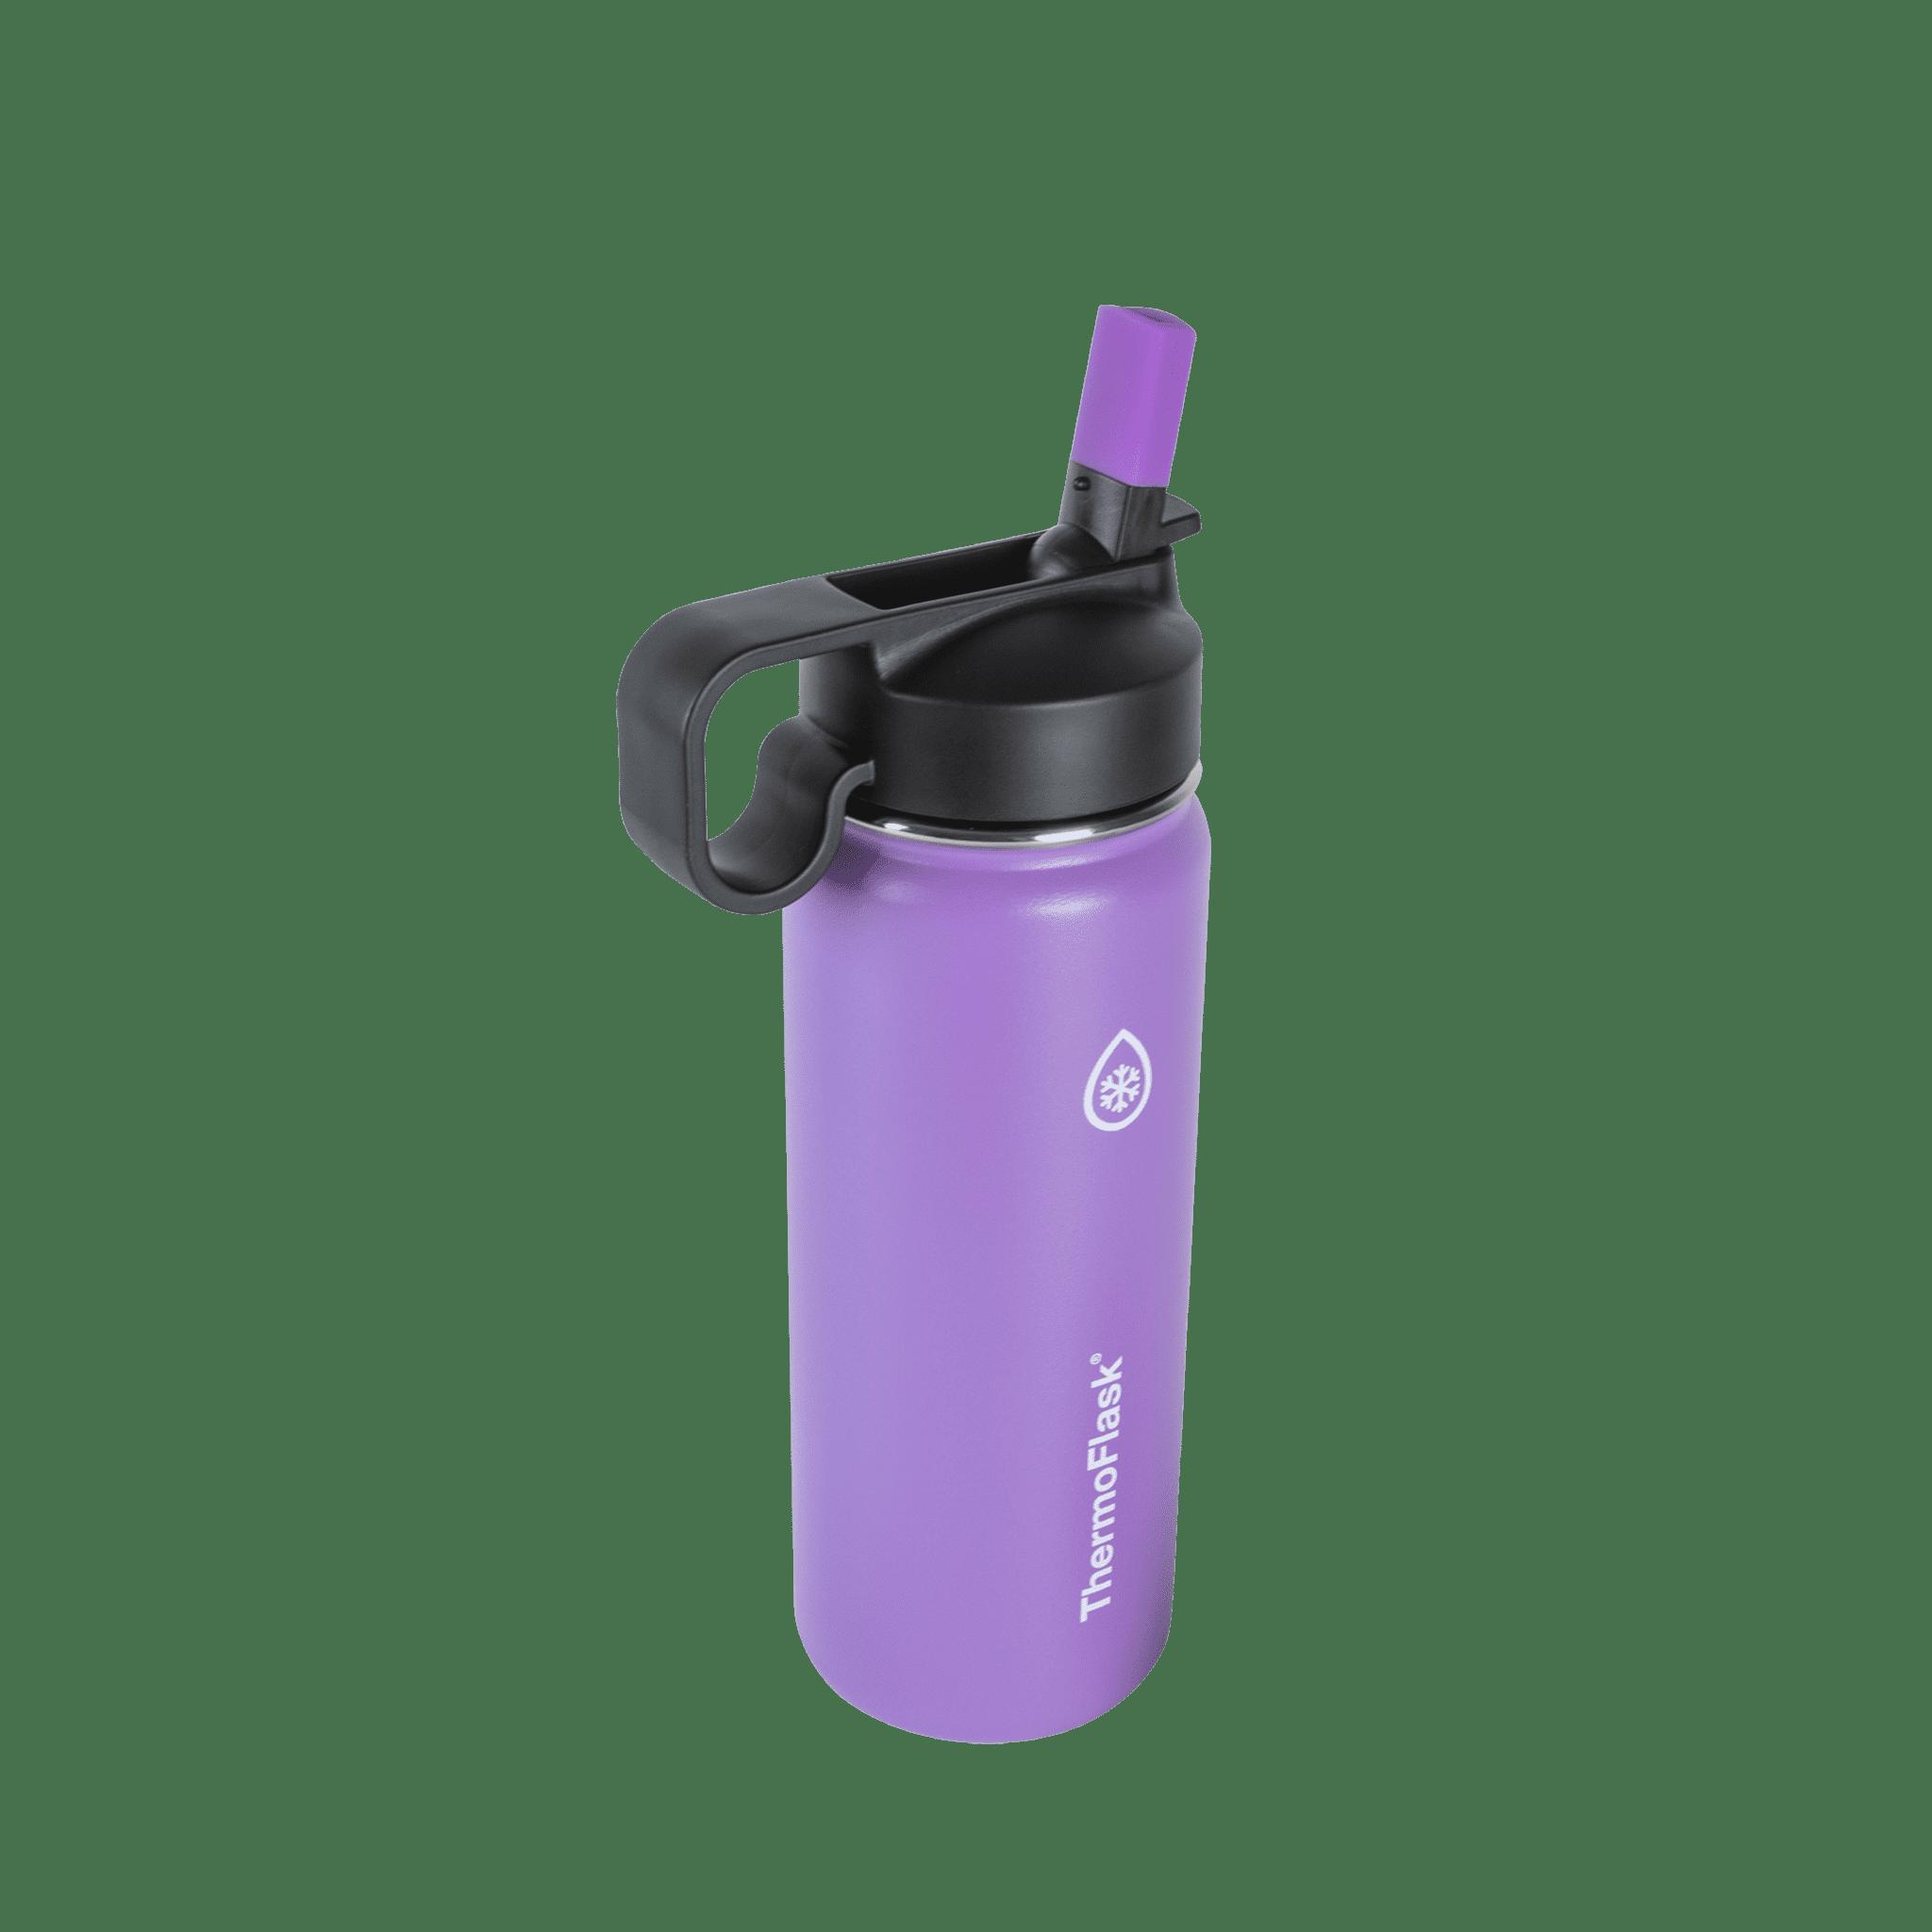 0259 Healthy Coffee Orange Juice Milk Easy To Carry Carton Bottle BPA Free